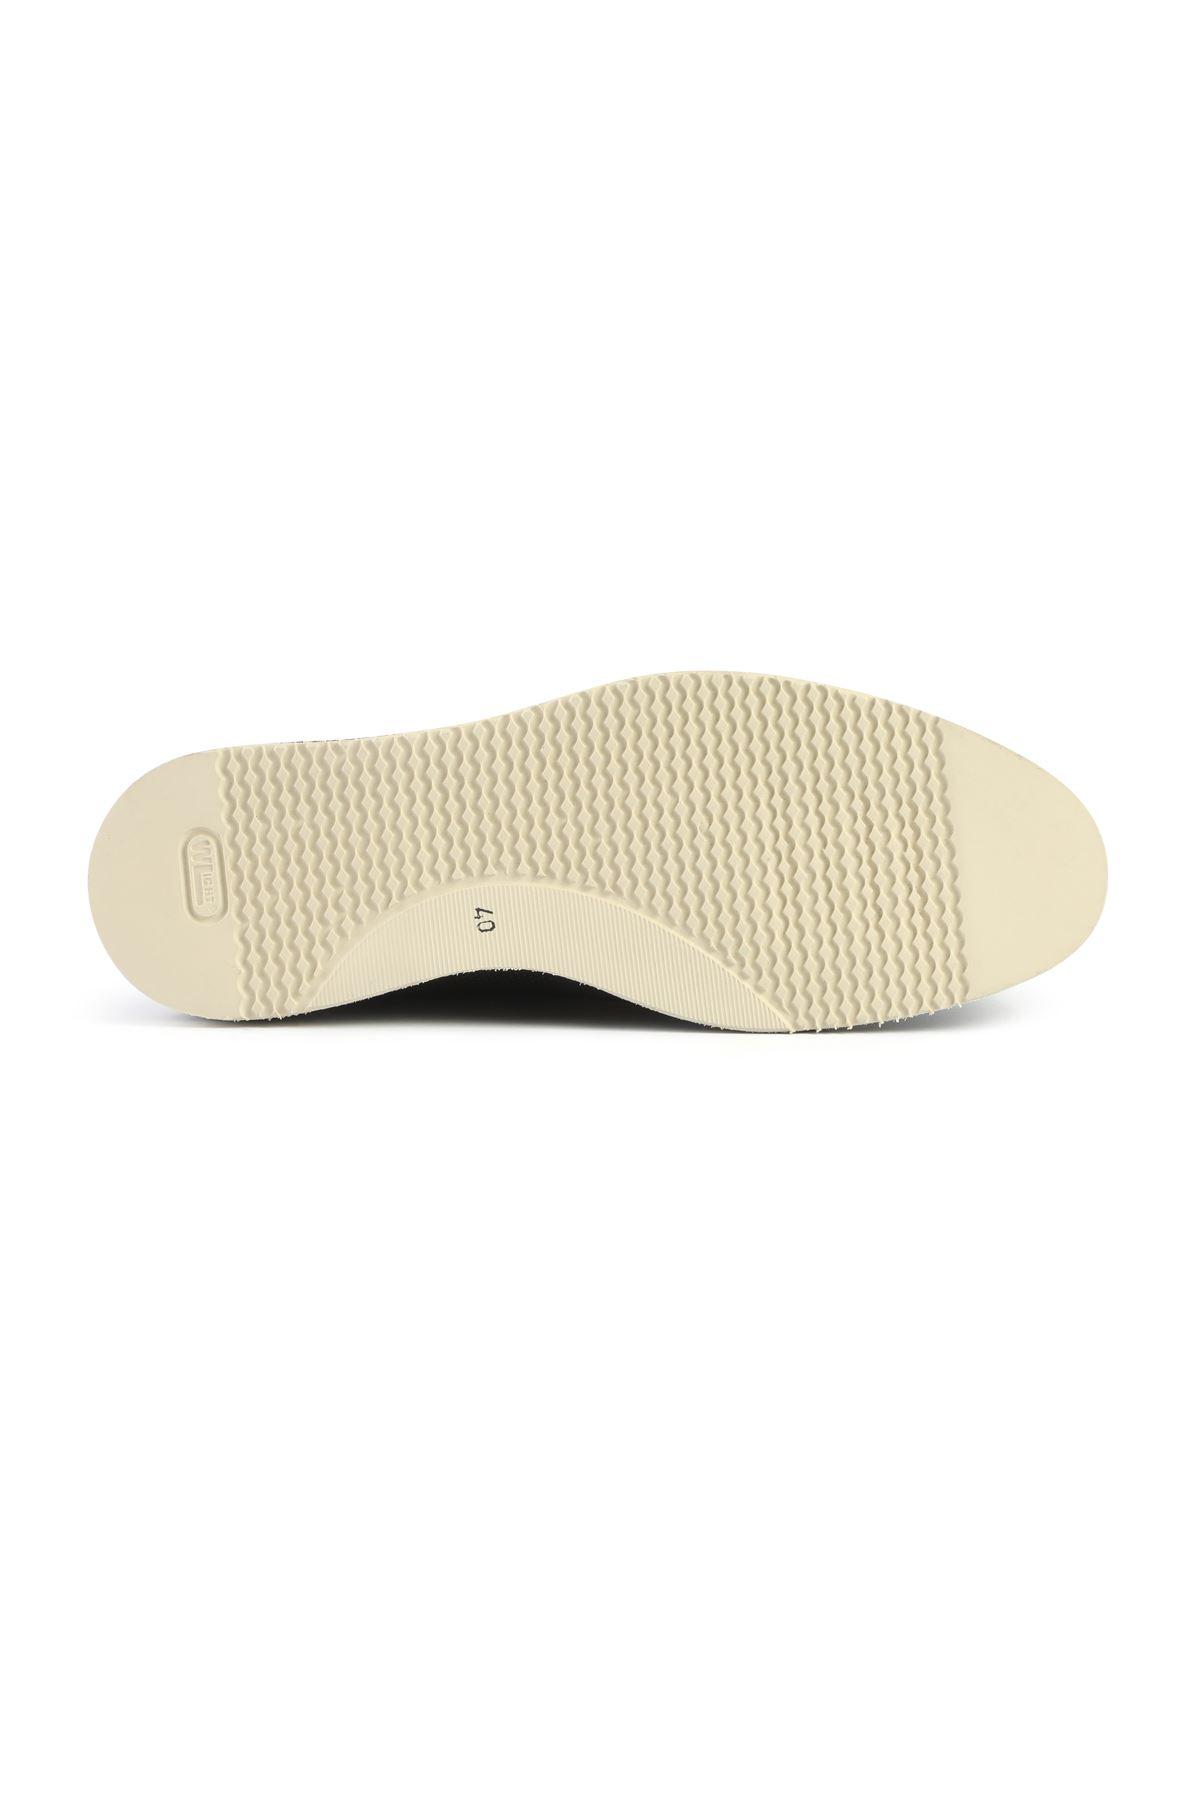 Libero 3052 Mink Oxford Shoes